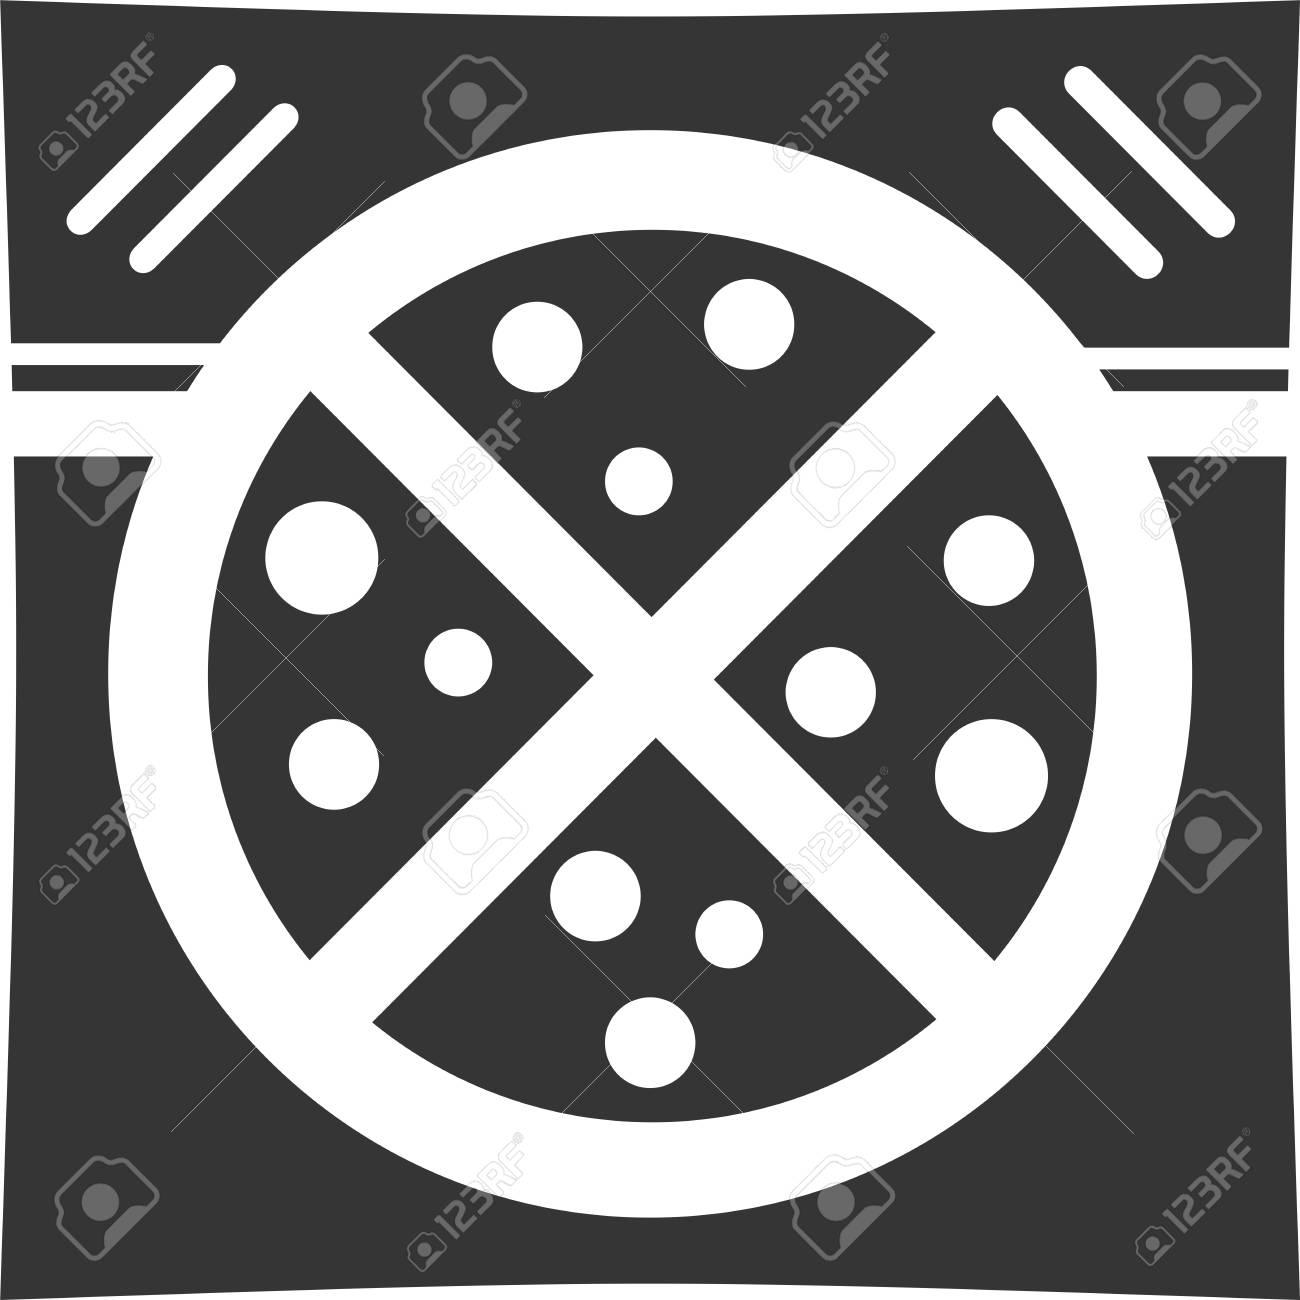 Icon Created By Aaron Fitch Wayoutcreative 2017 Aaron R